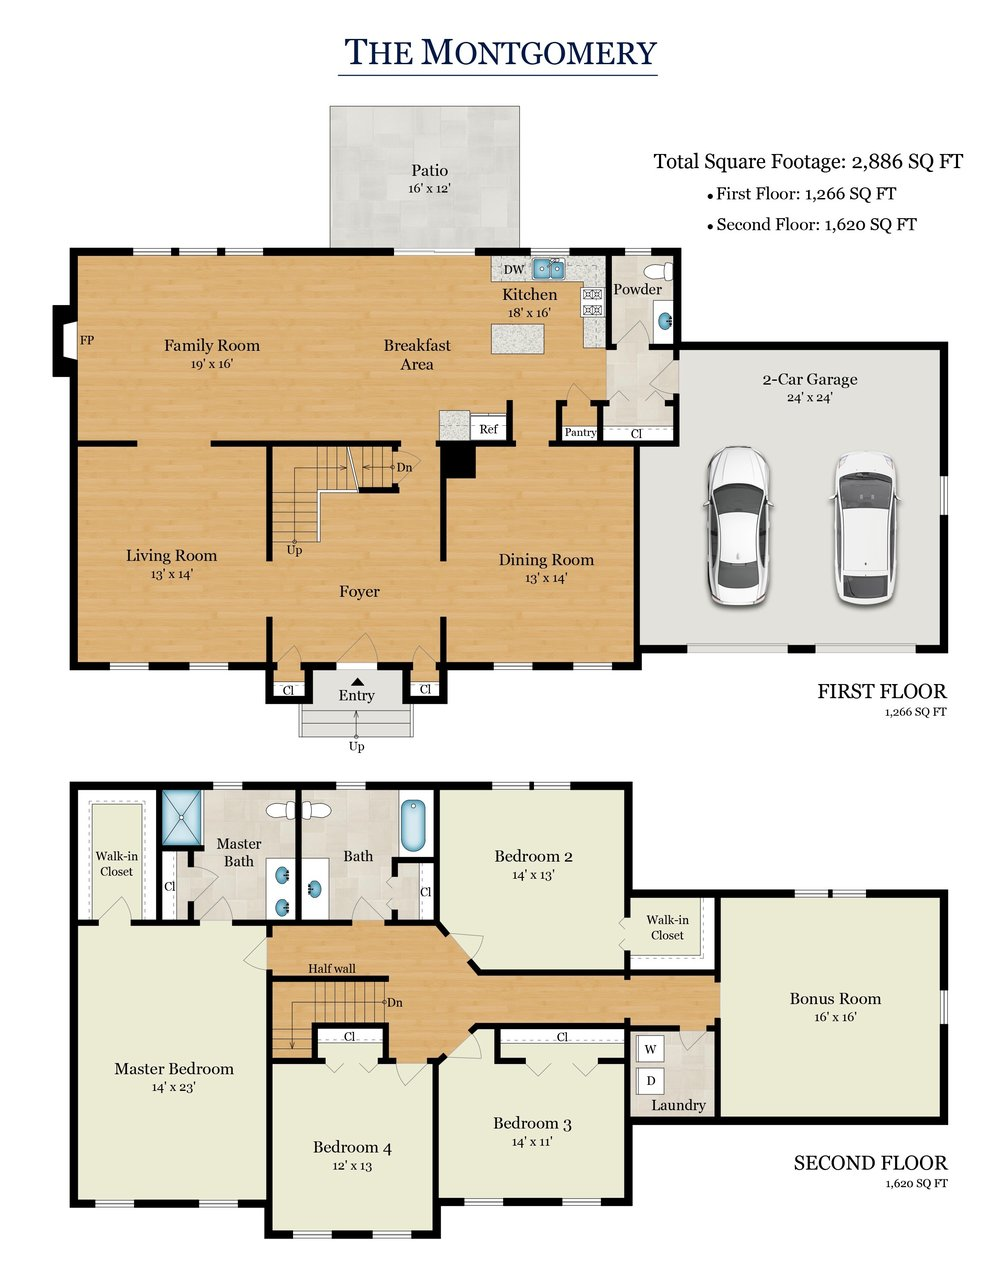 CFP-TheMontgomery-FloorPlan-Print-R7.jpg